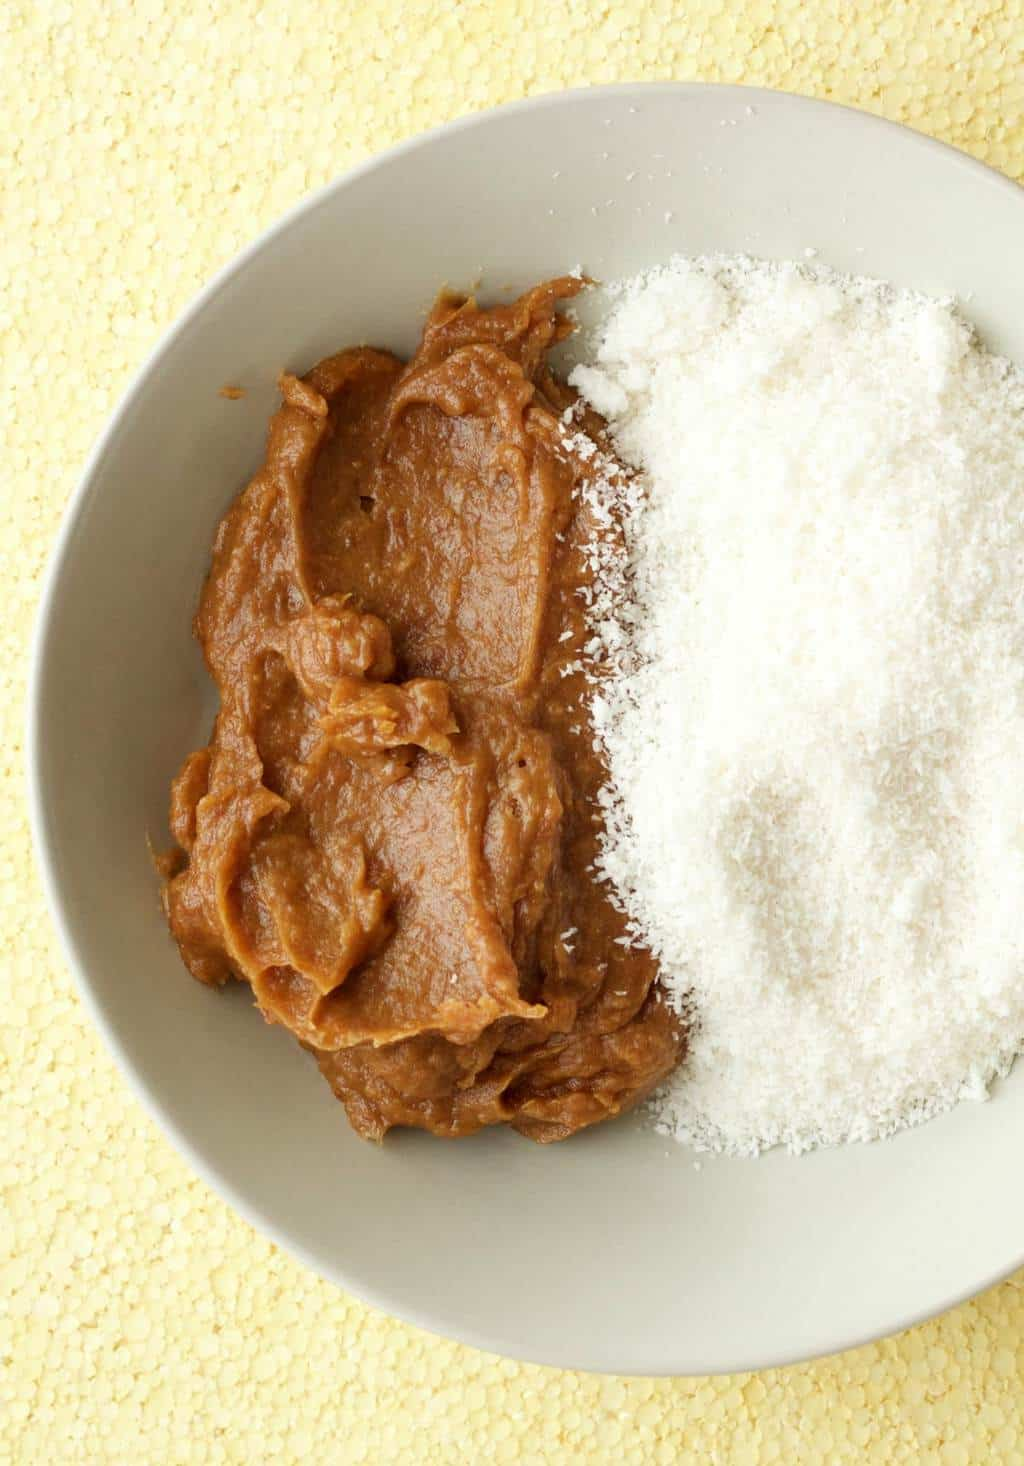 Making Chocolate Coconut Date Balls #vegan #lovingitvegan #dessert #dateballs